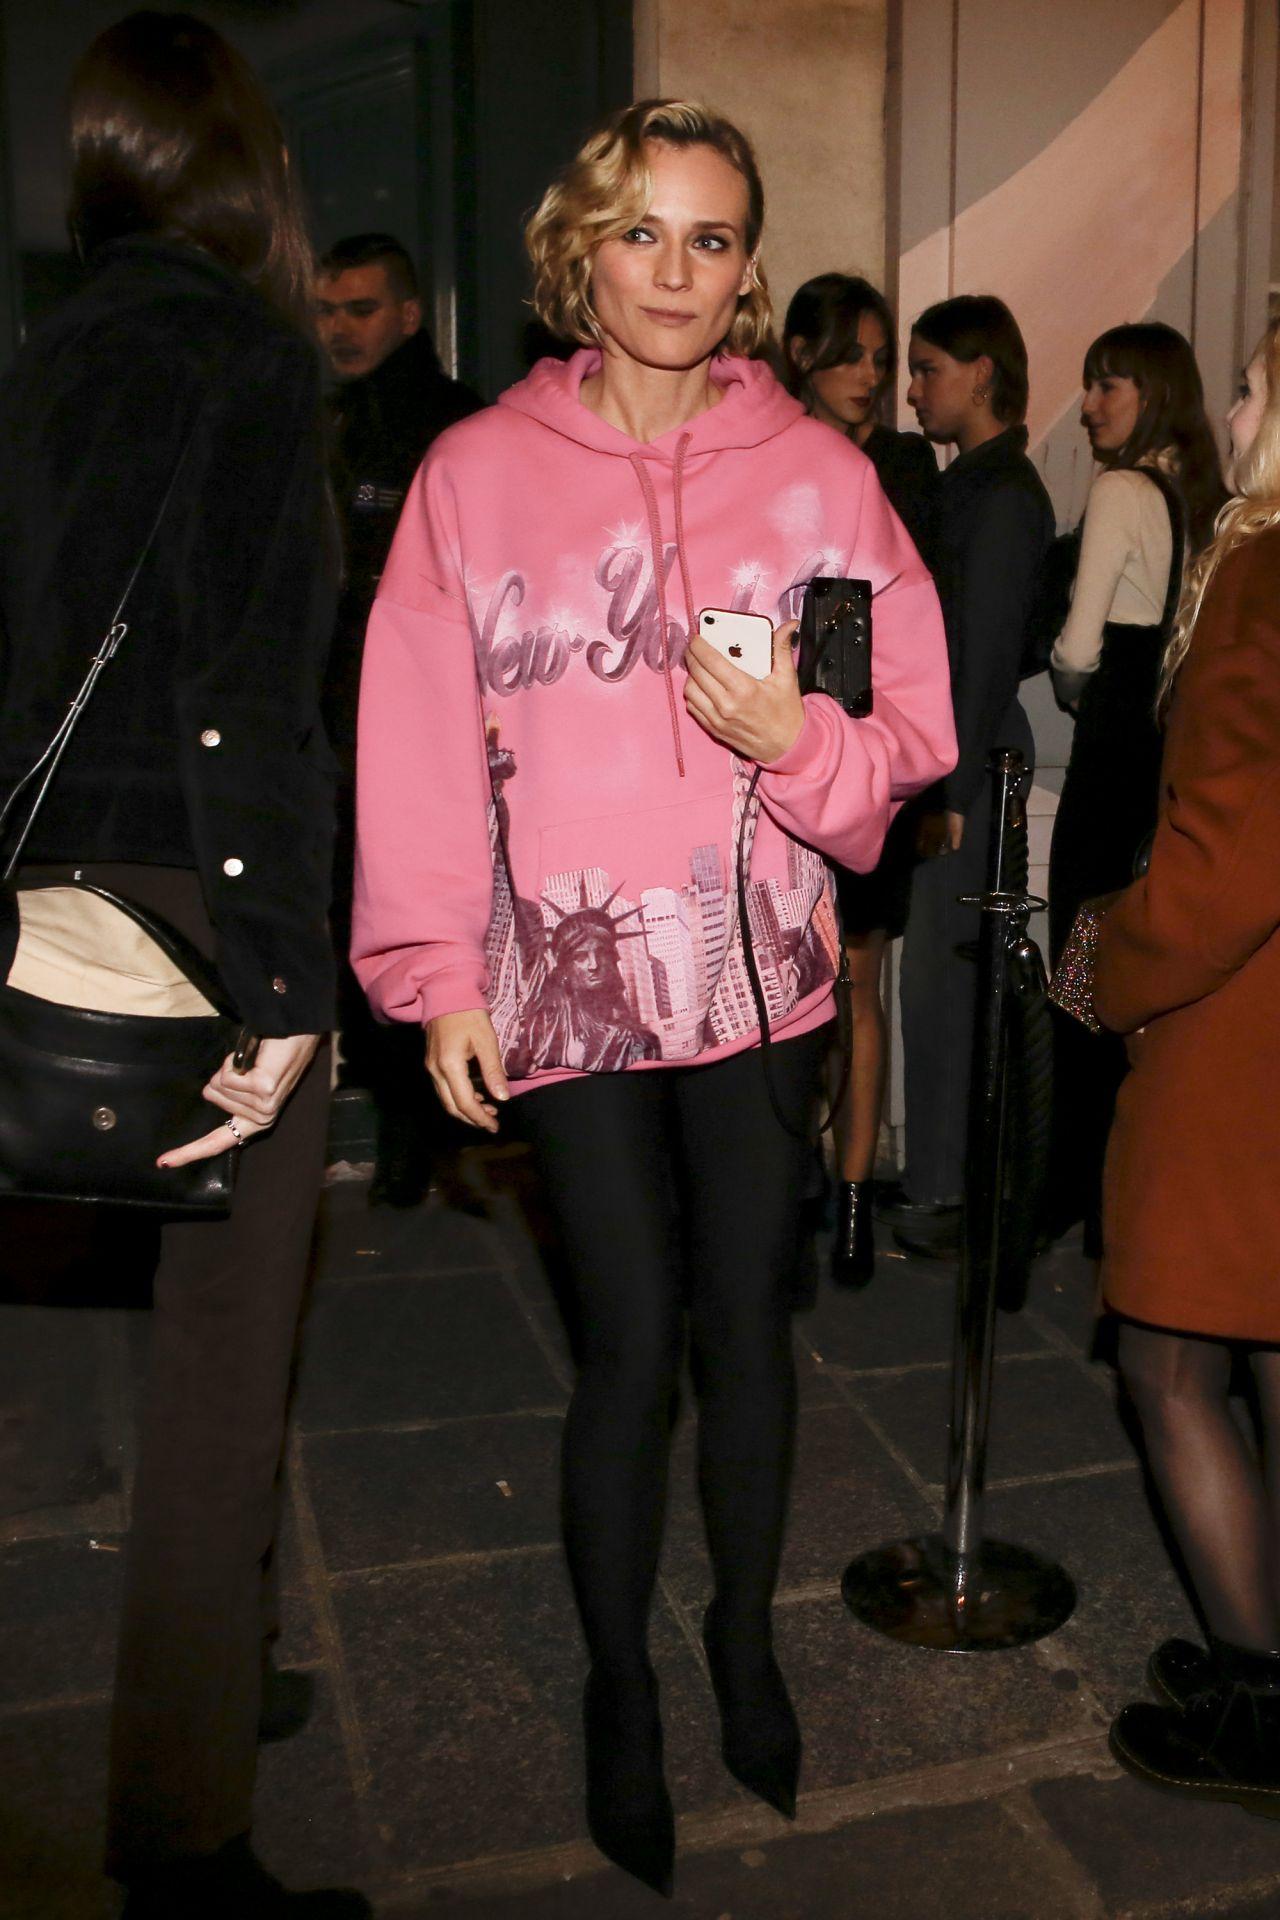 http://celebmafia.com/wp-content/uploads/2018/01/diane-kruger-at-yves-saint-laurent-night-paris-fashion-week-01-17-2018-3.jpg